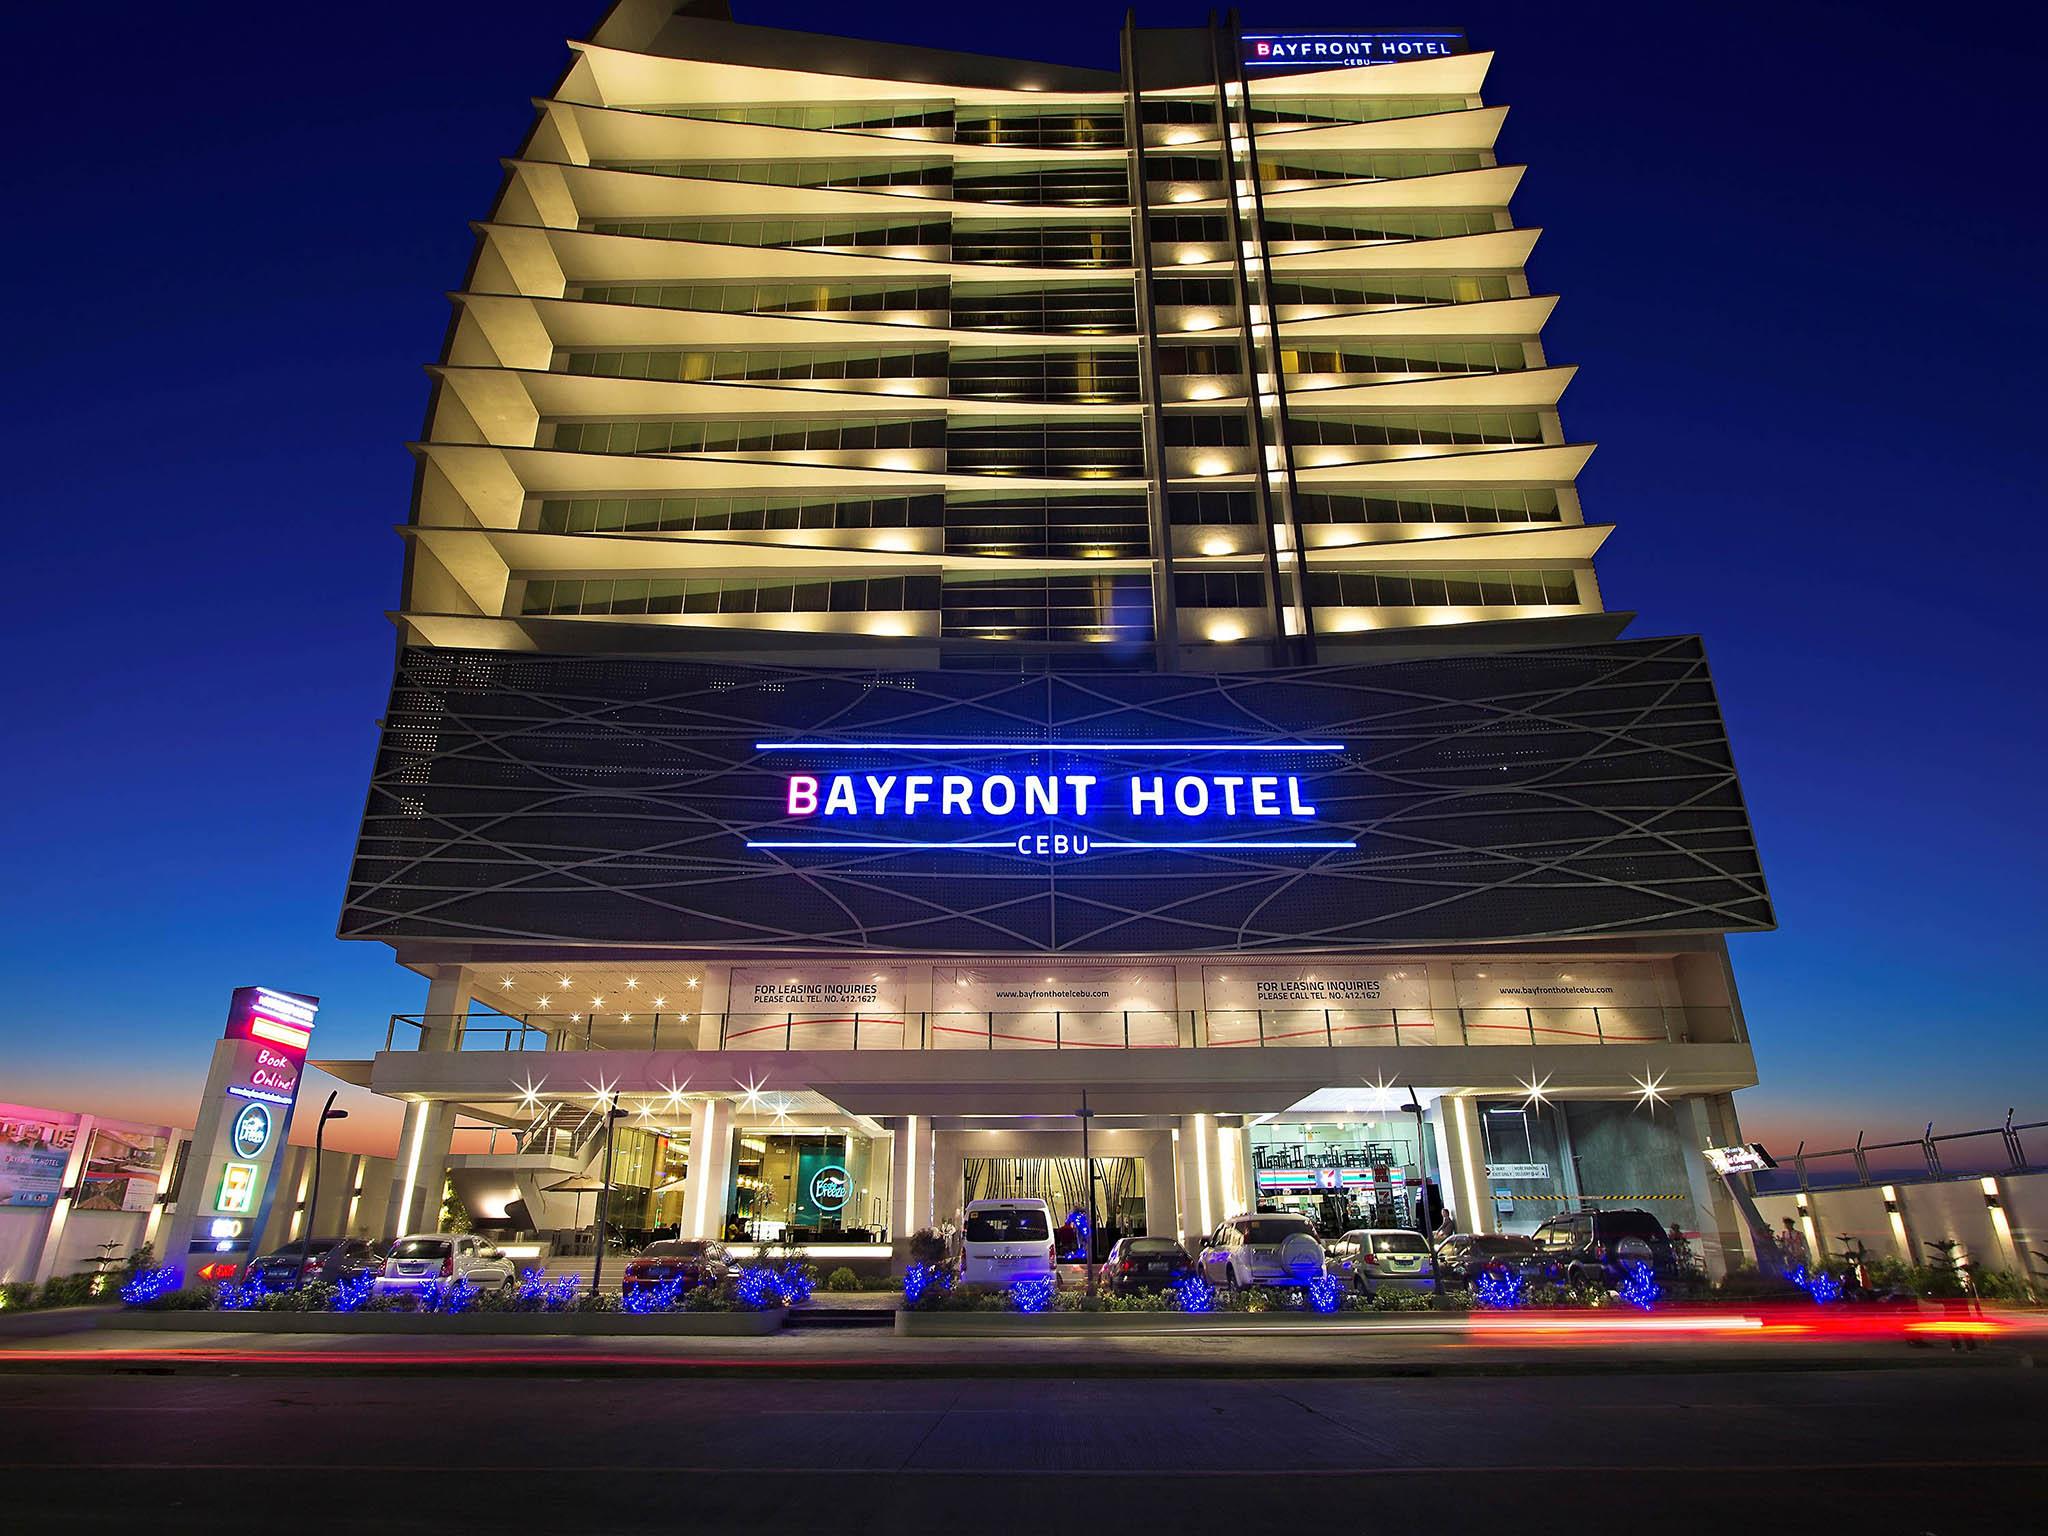 Destination Bayfront Hotel Cebu